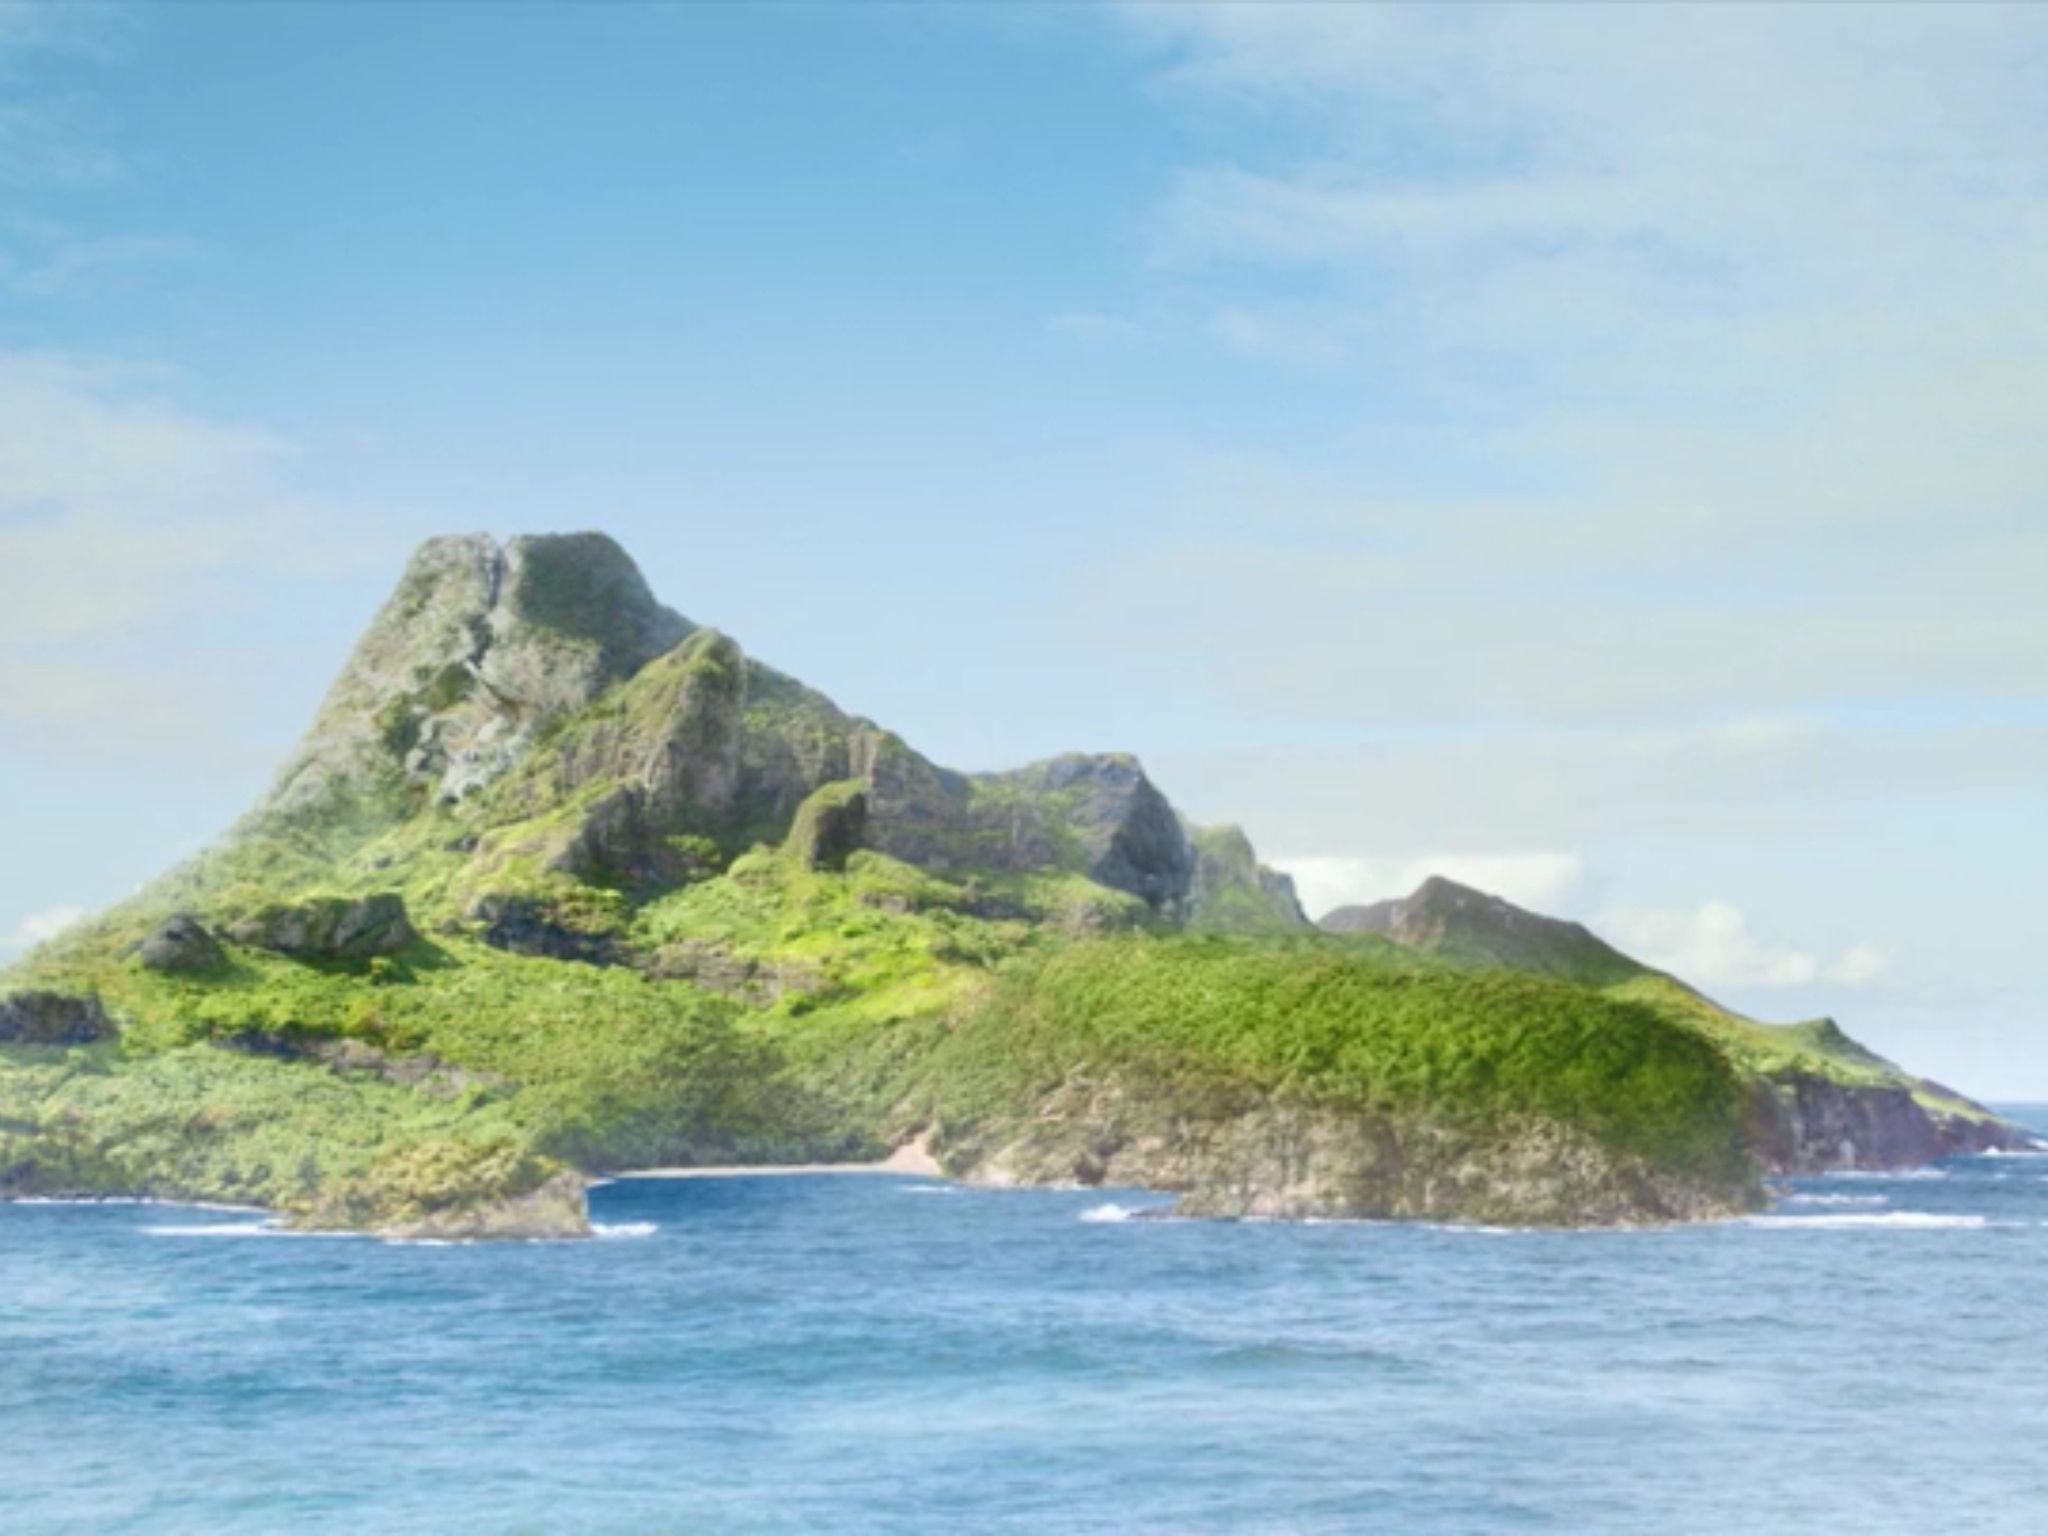 Mako Island From Mako Mermaids H2o Just Add Water Mako Mermaids